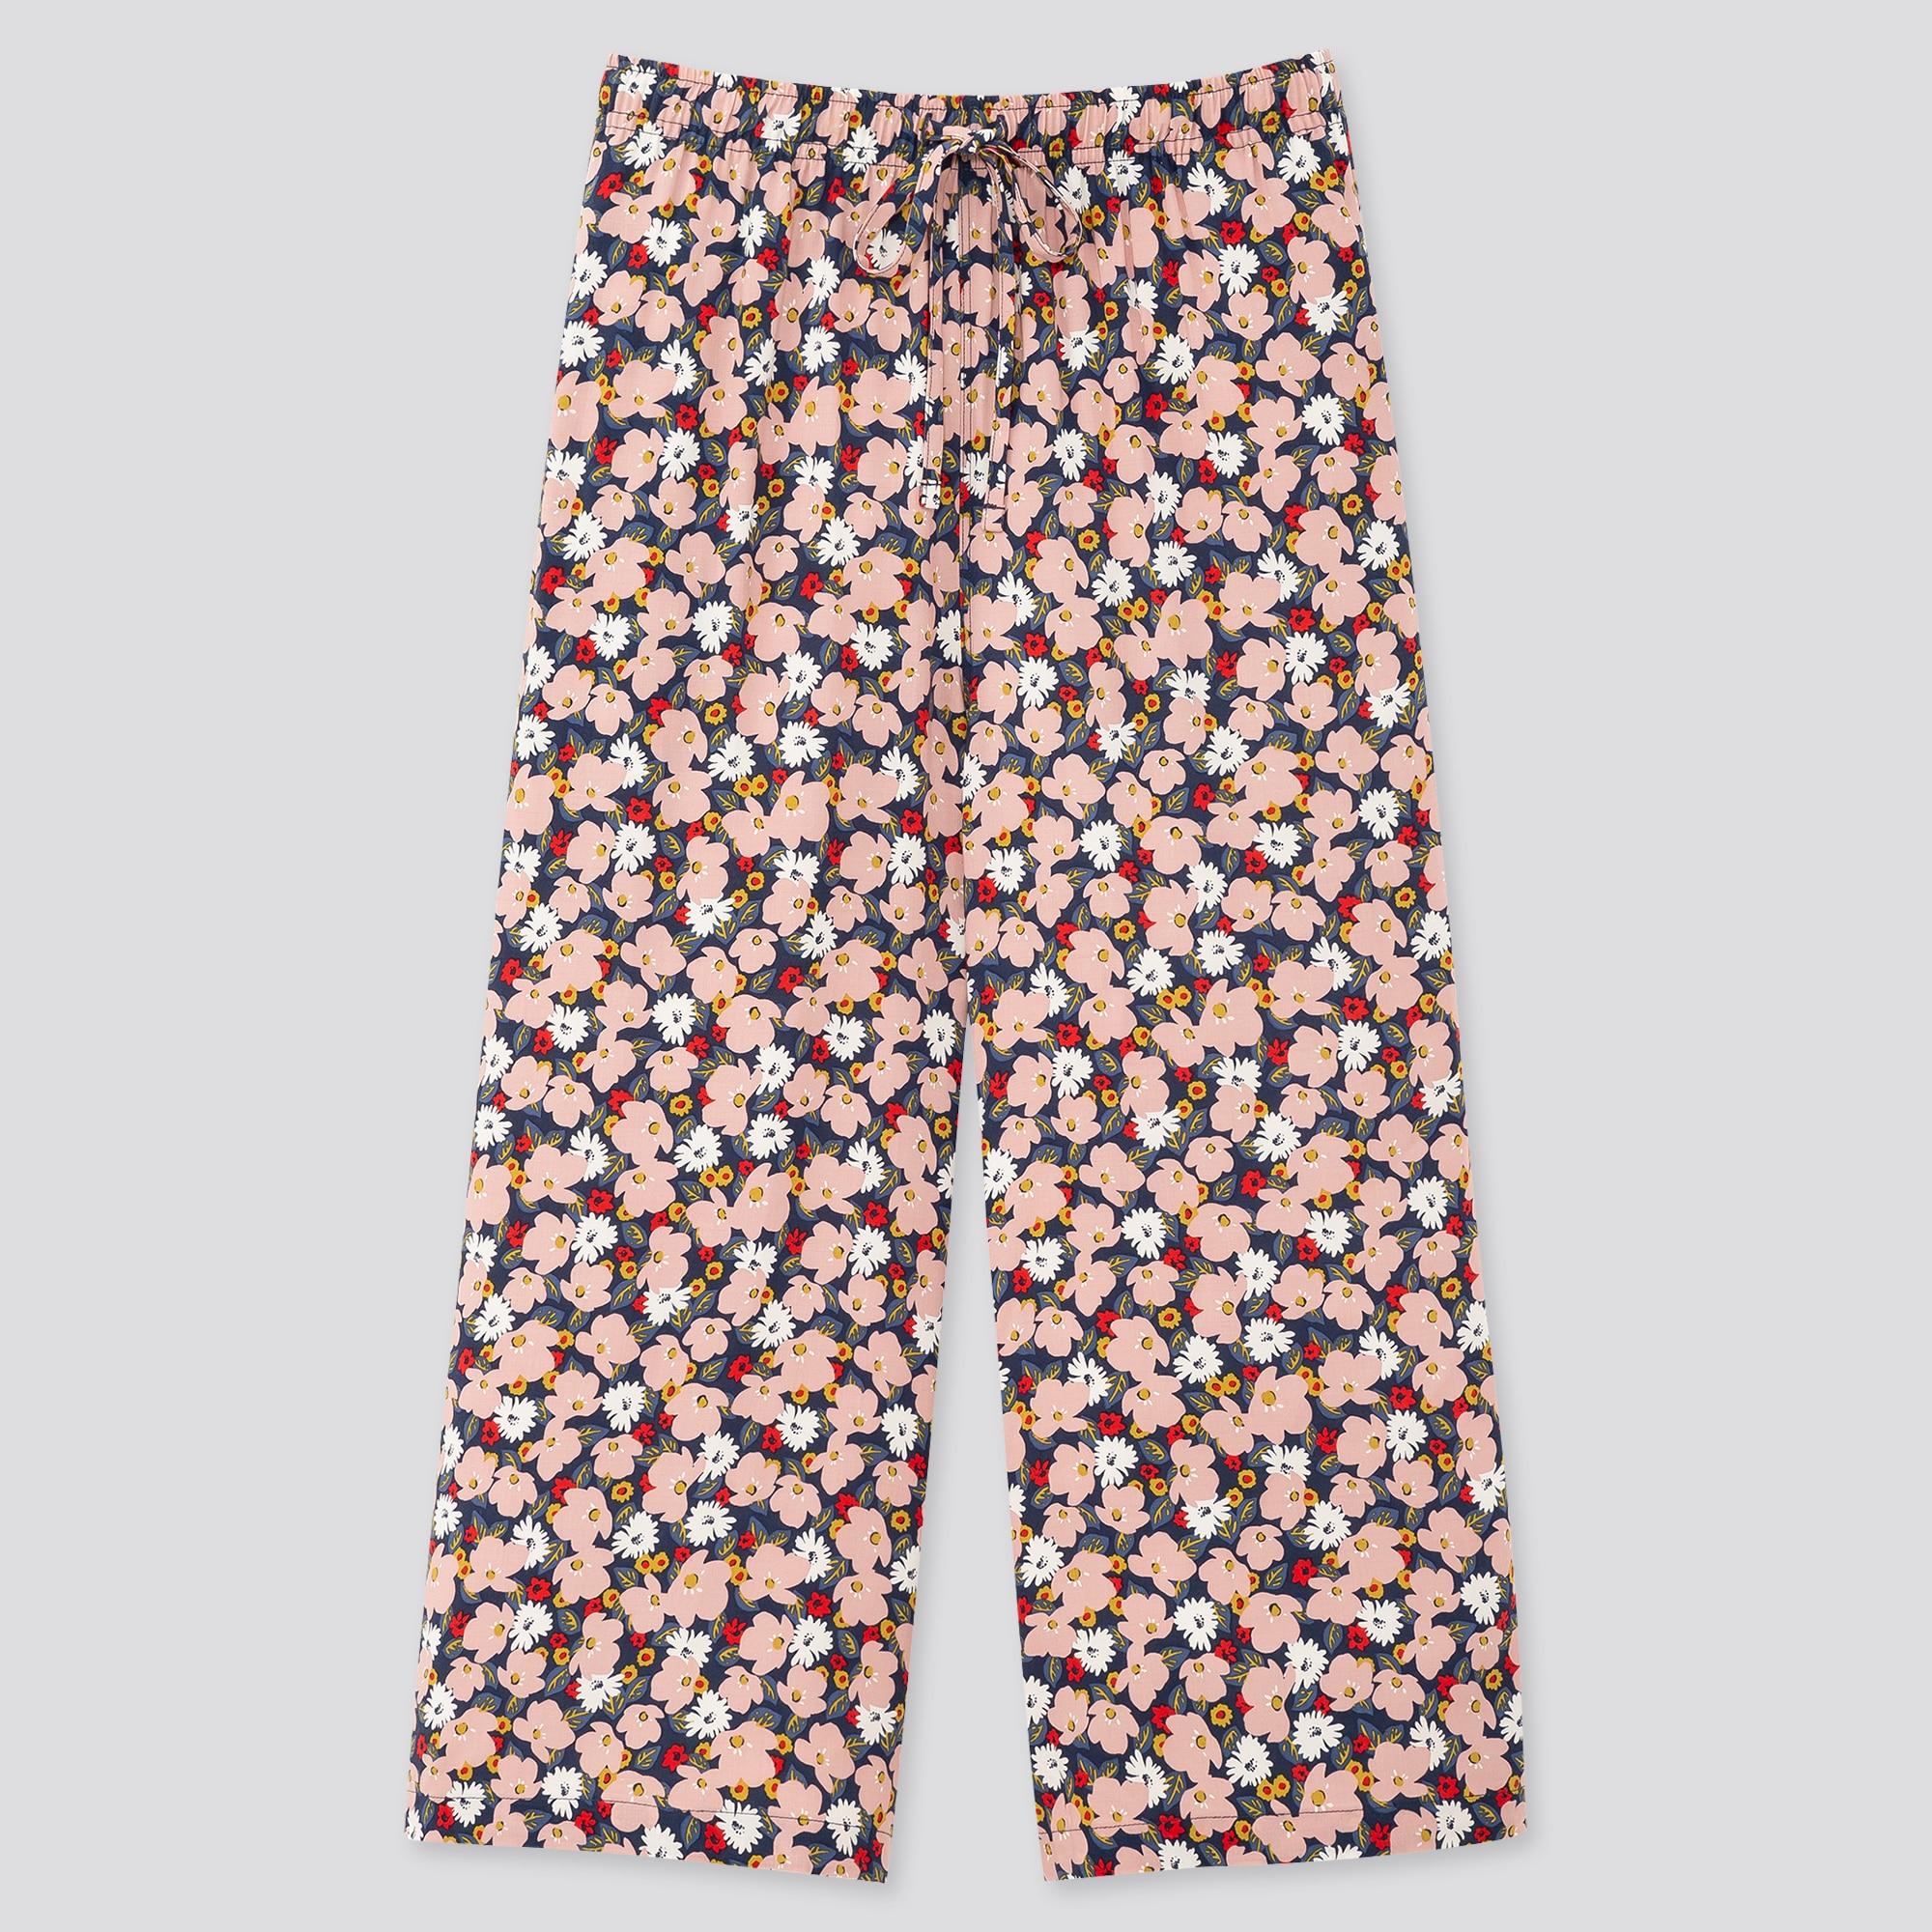 Women Joy of Print Relaco Wide Fit 3/4 Length Shorts